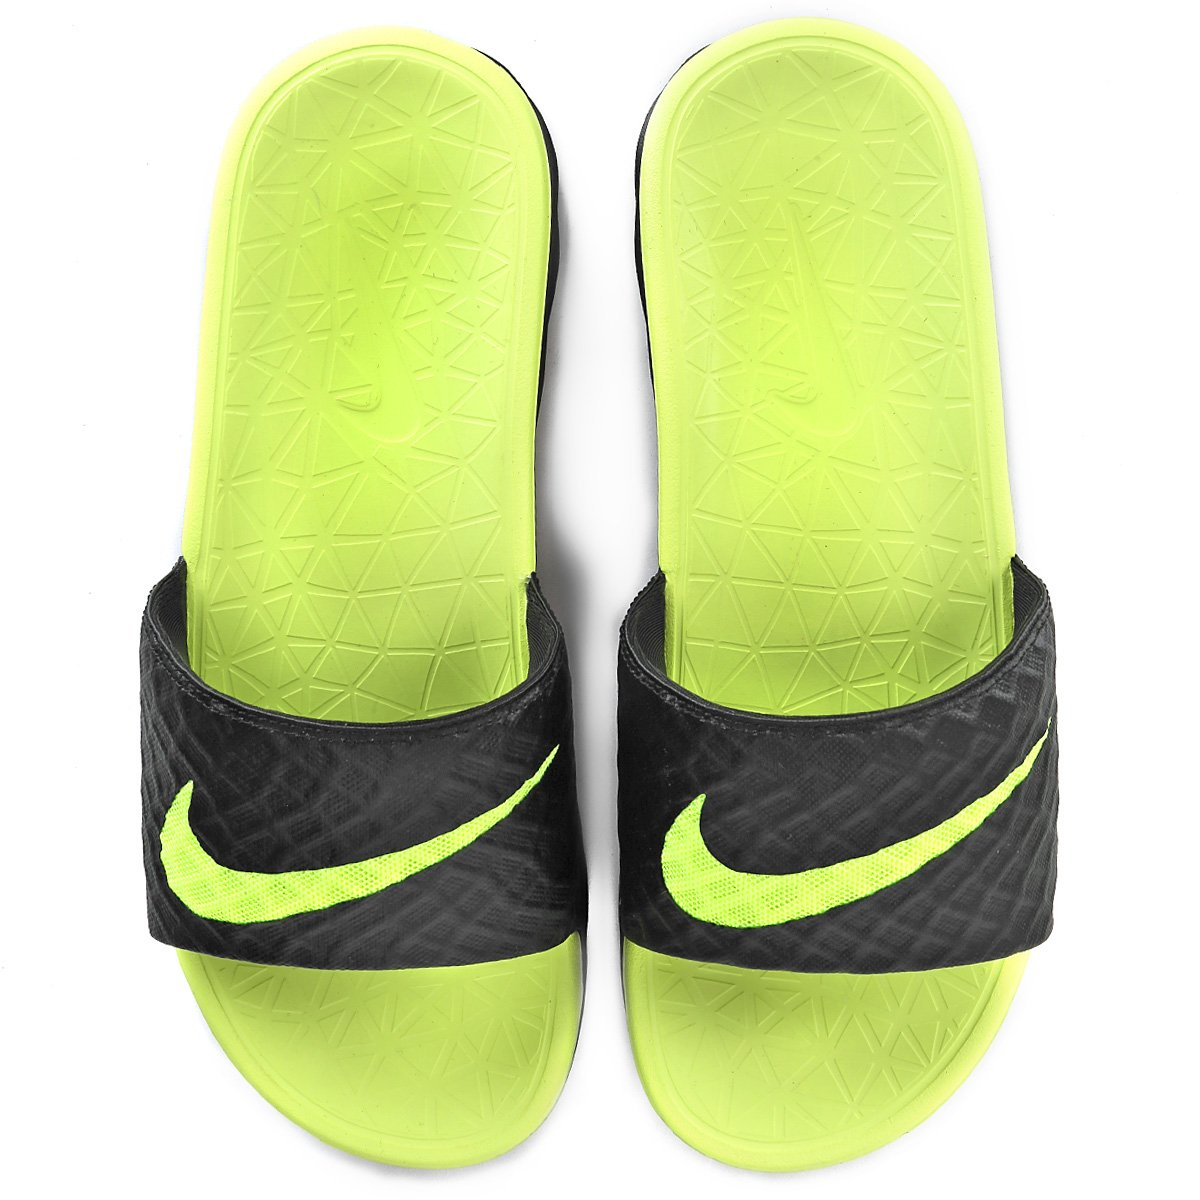 9aed4945fd1 Chinelo Nike Benassi Solarsoft - Compre Agora